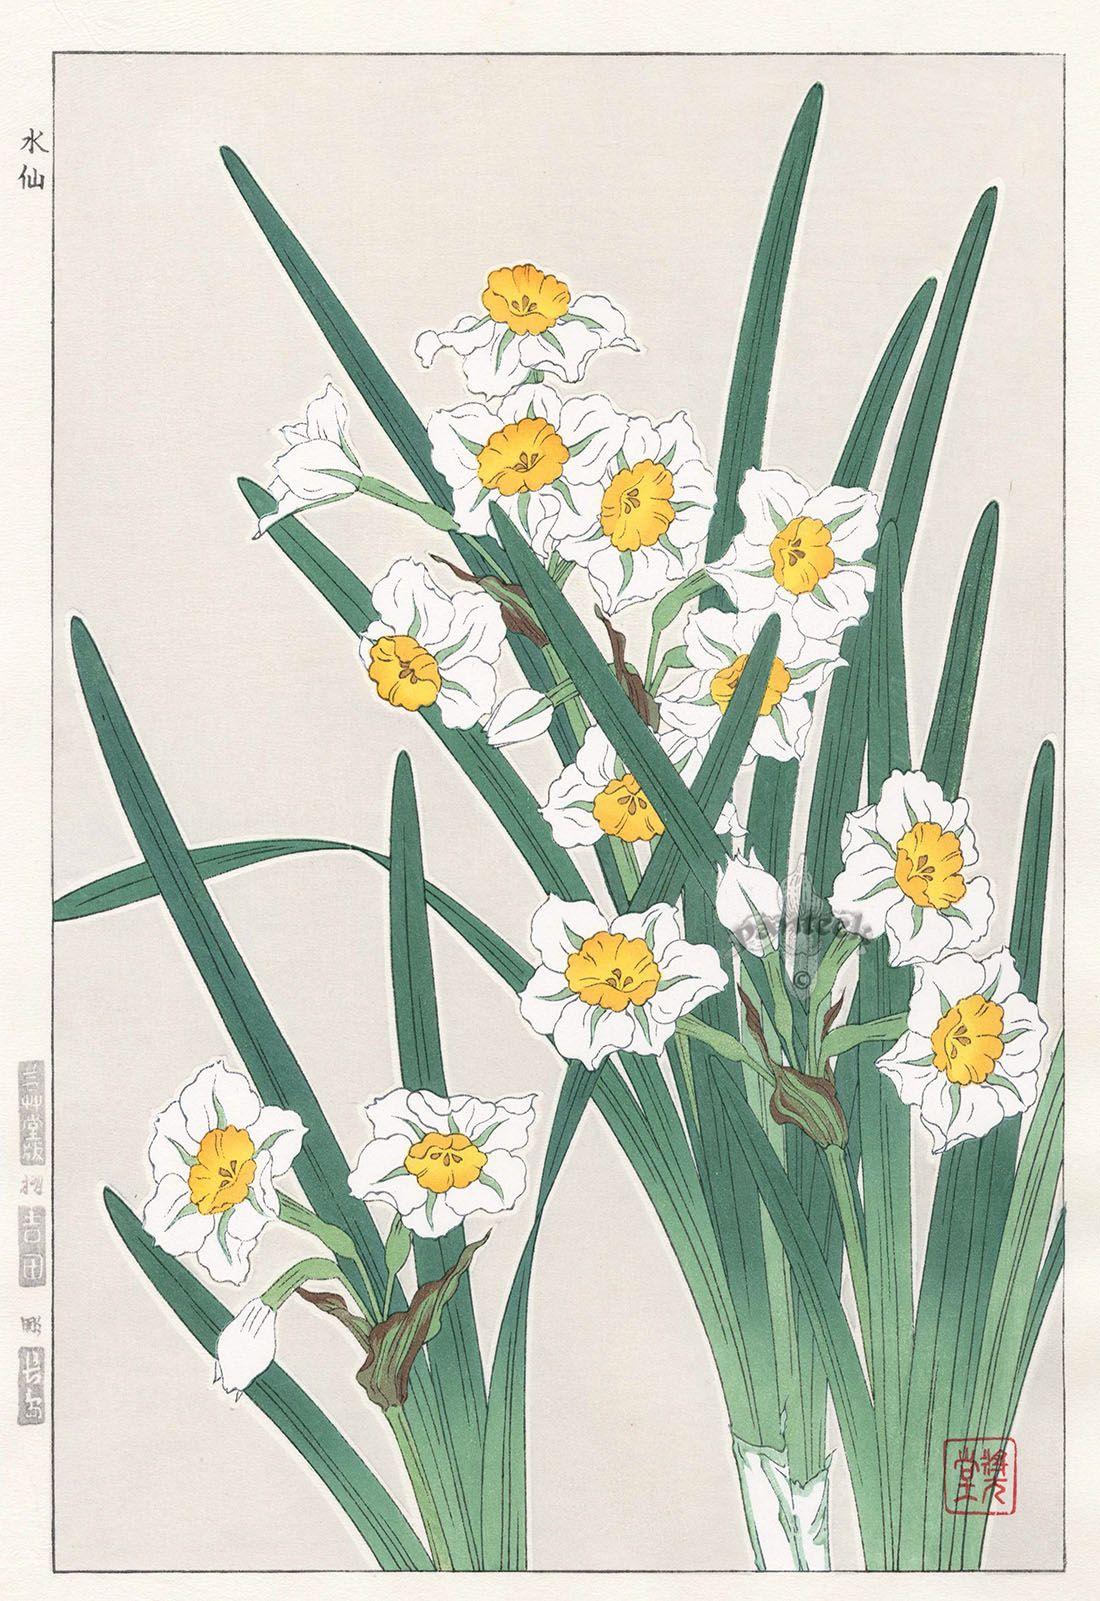 Narcissus From Shodo Kawarazaki Spring Flower Japanese Woodblock Prints Japanese Woodblock Printing Japanese Art Woodblock Print